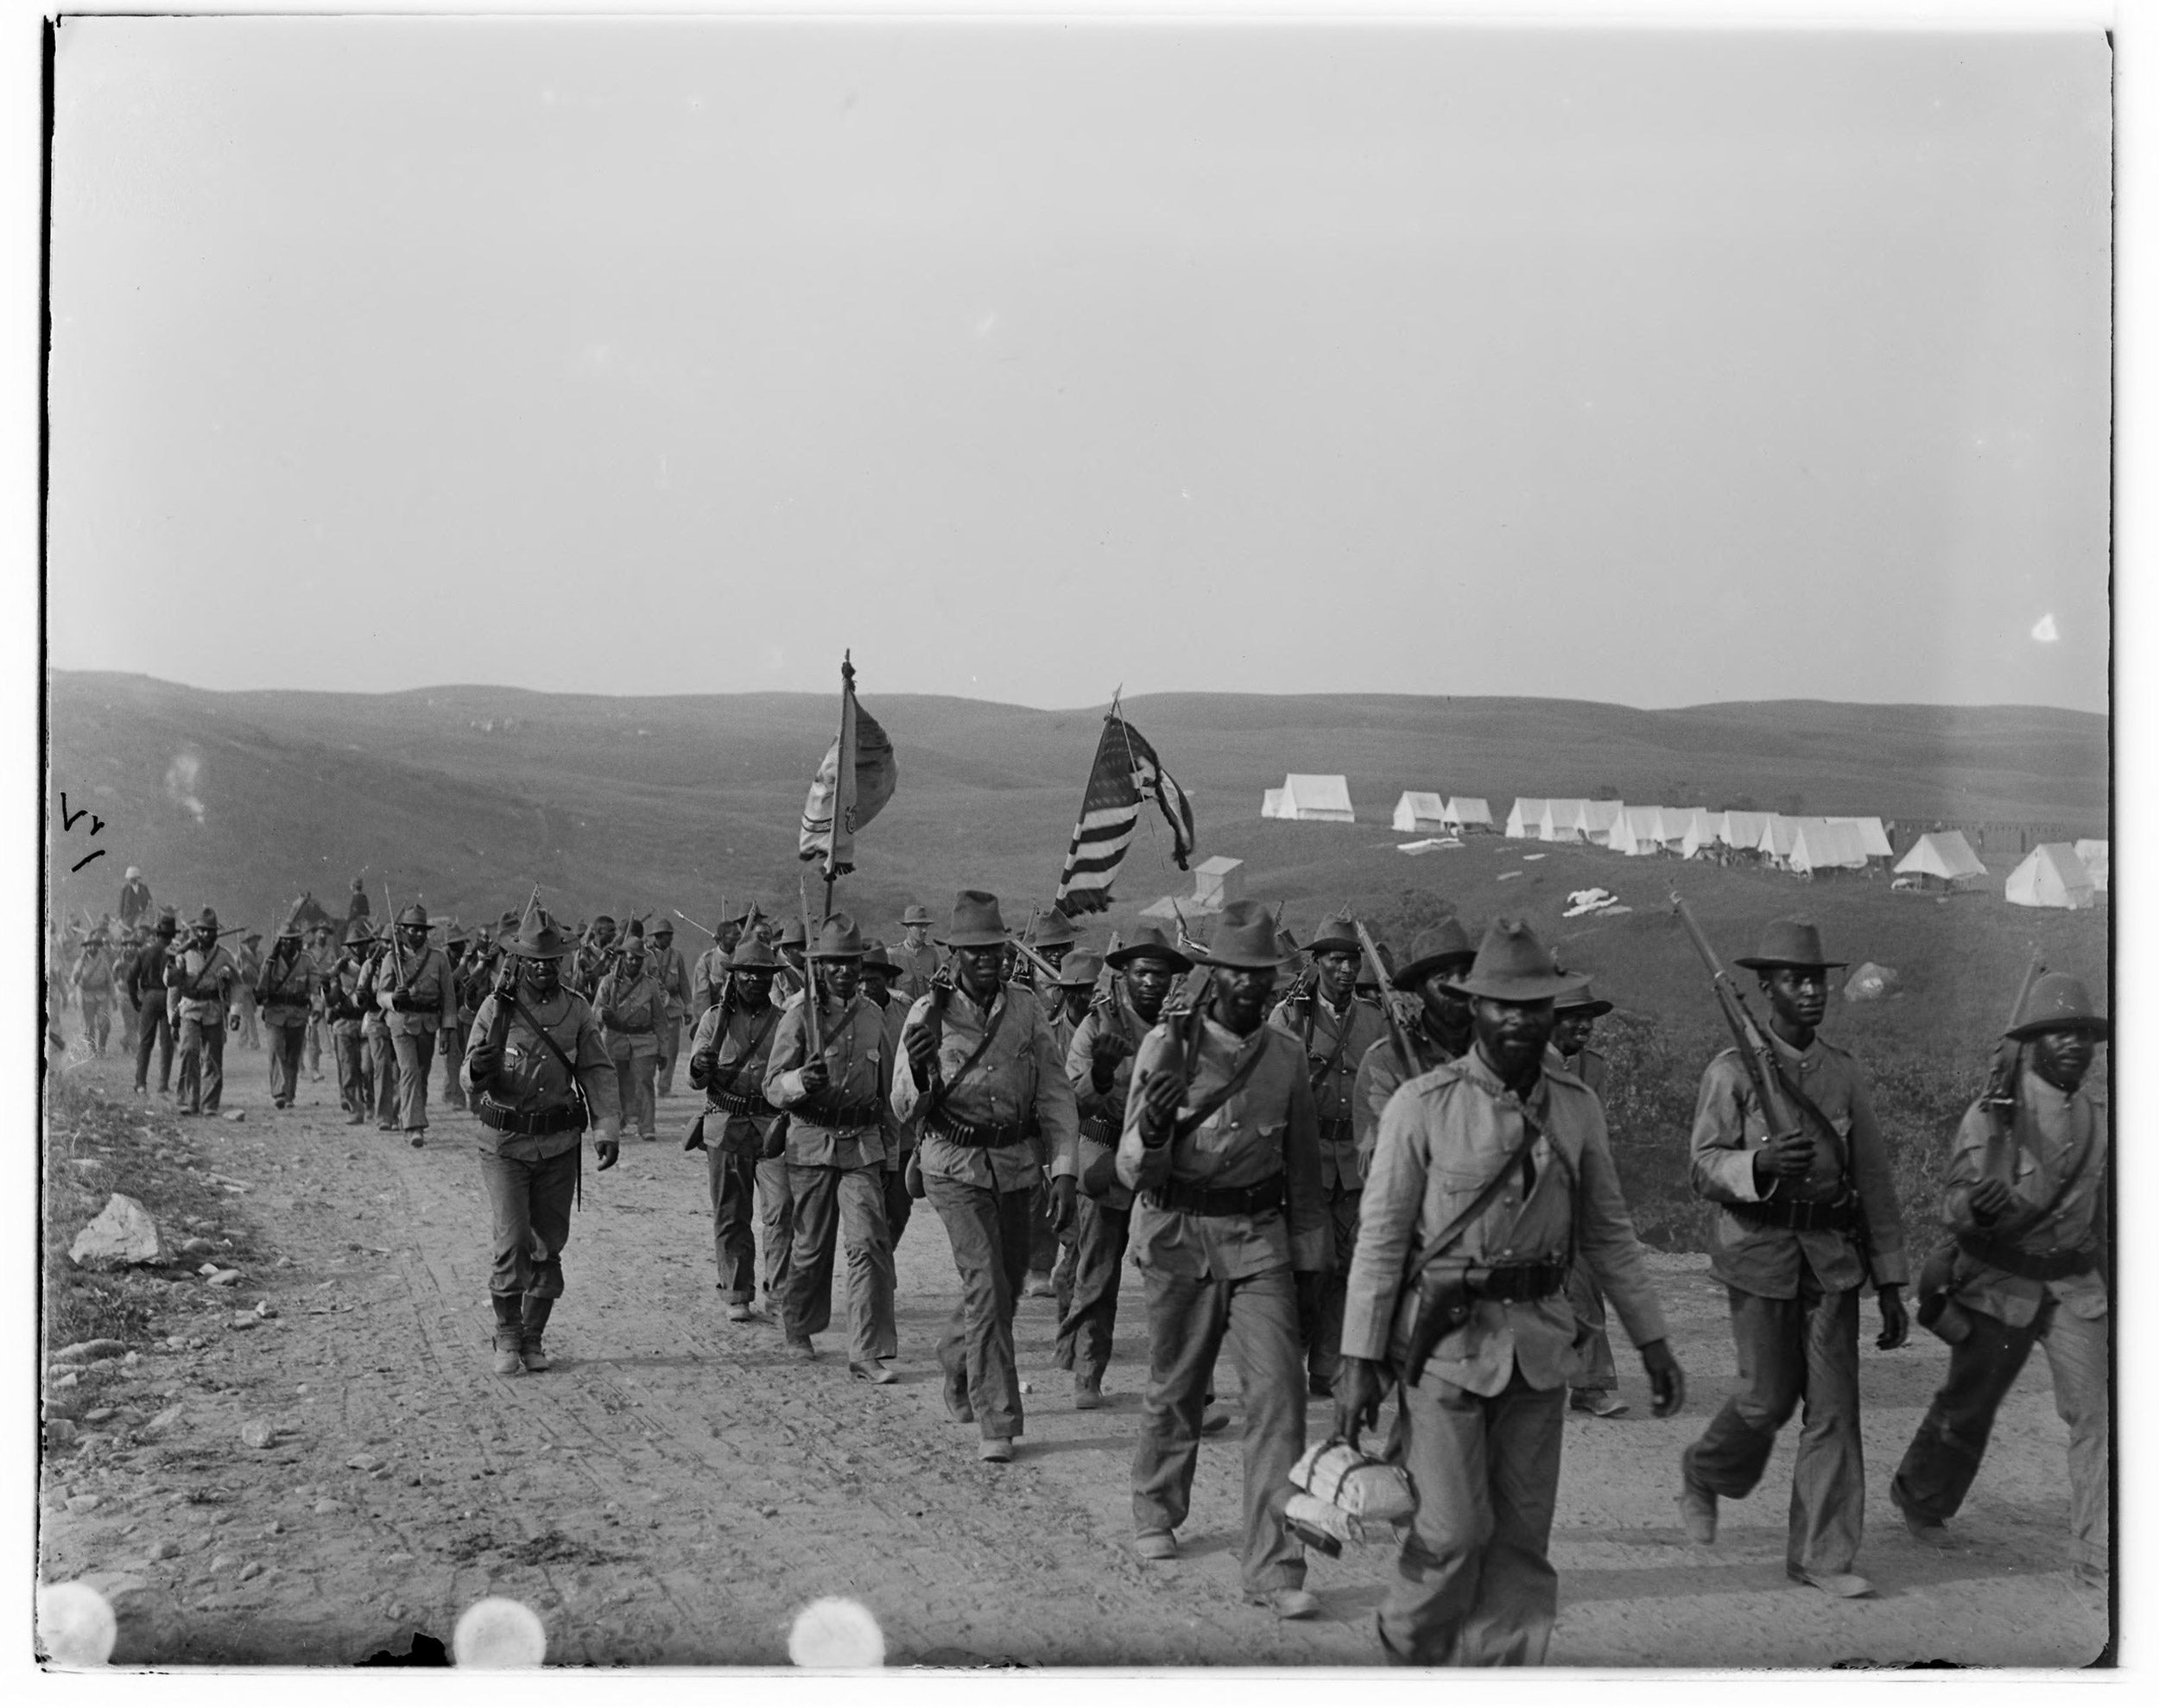 U.S. Army's 24th Infantry Regiment.